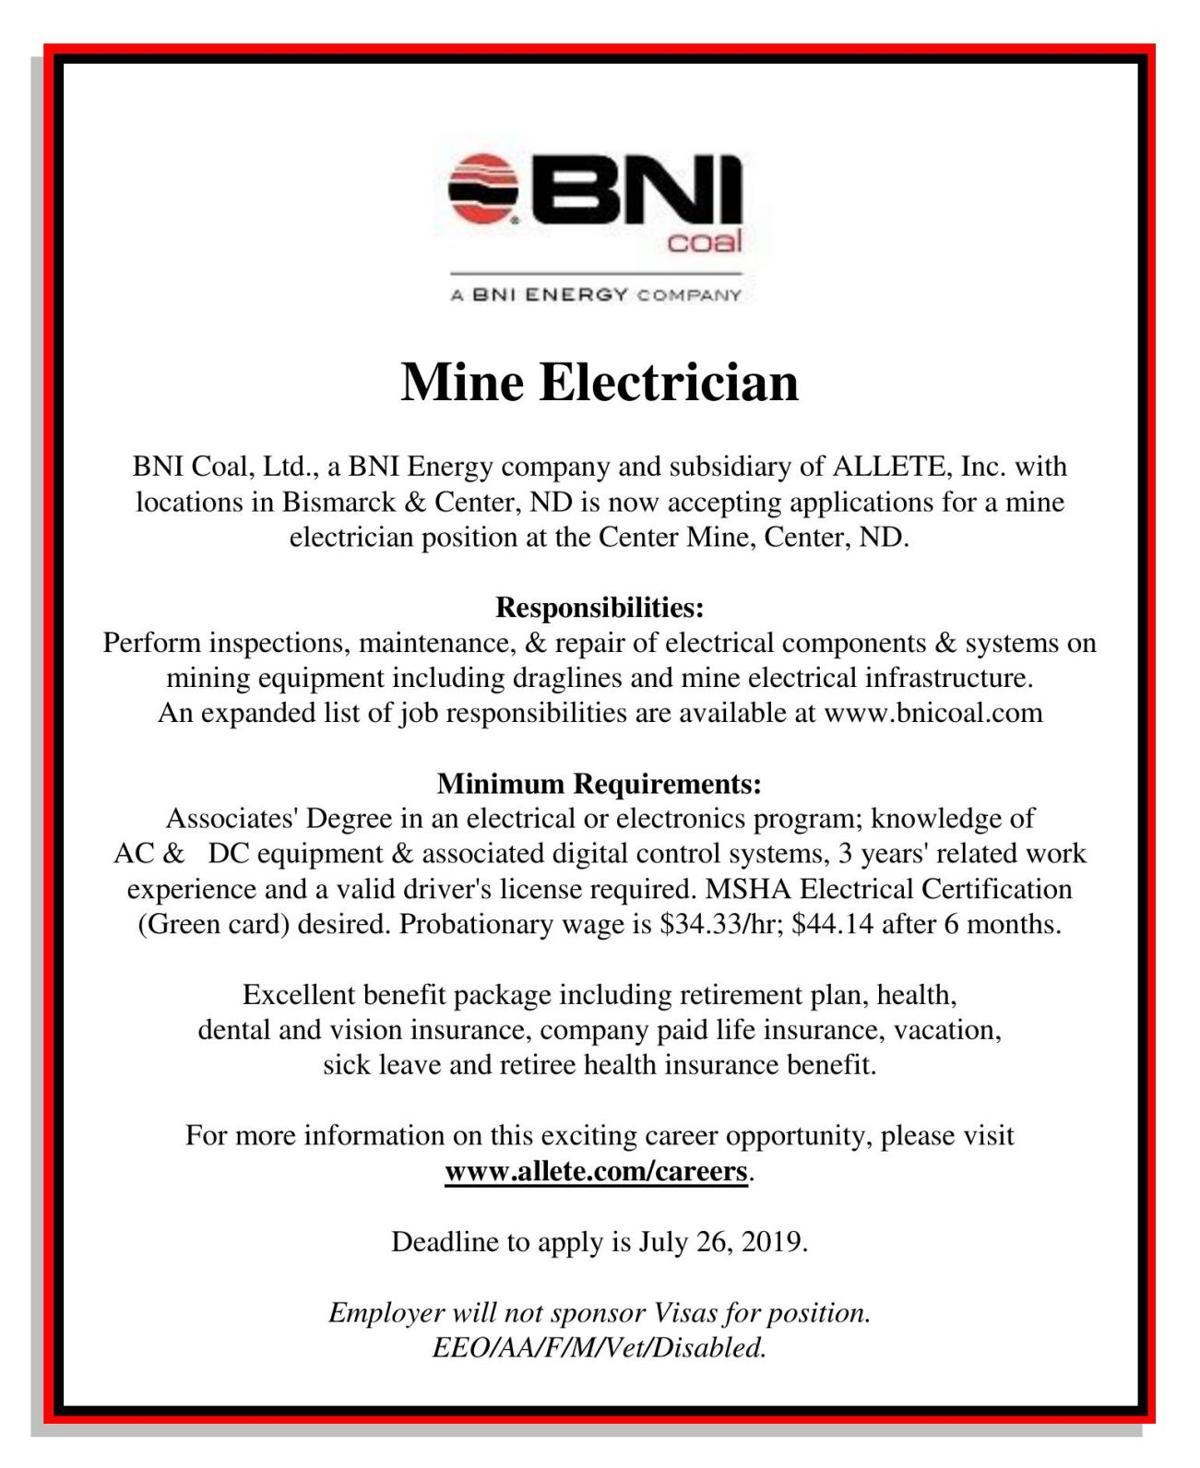 Mine Electrician